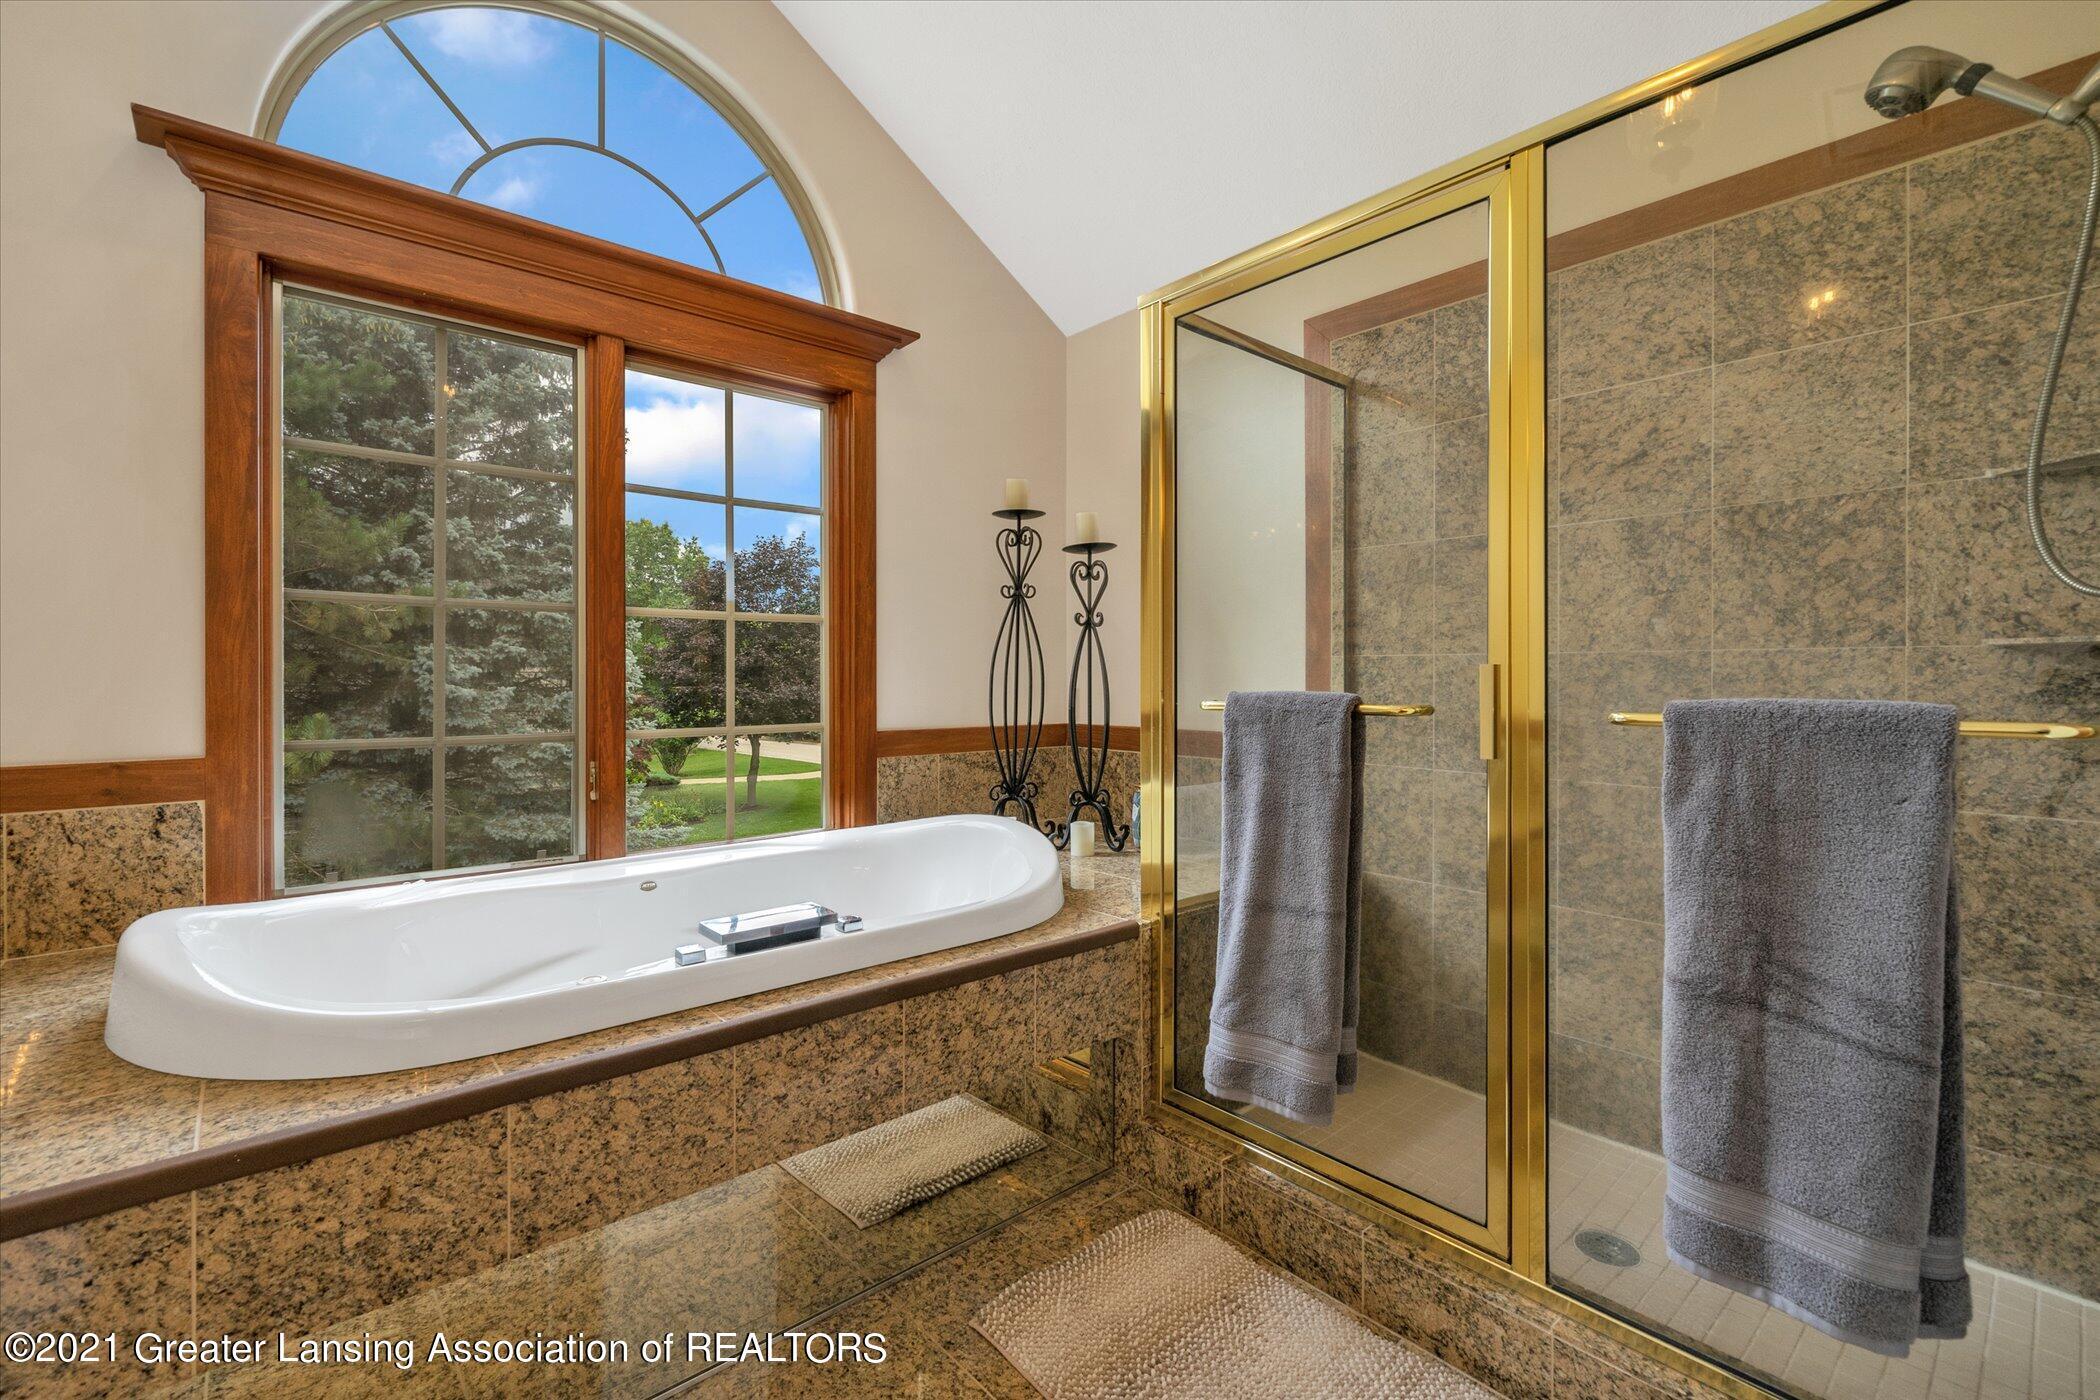 8100 Casandra Ln - UPPER LEVEL Primary Bathroom - 25